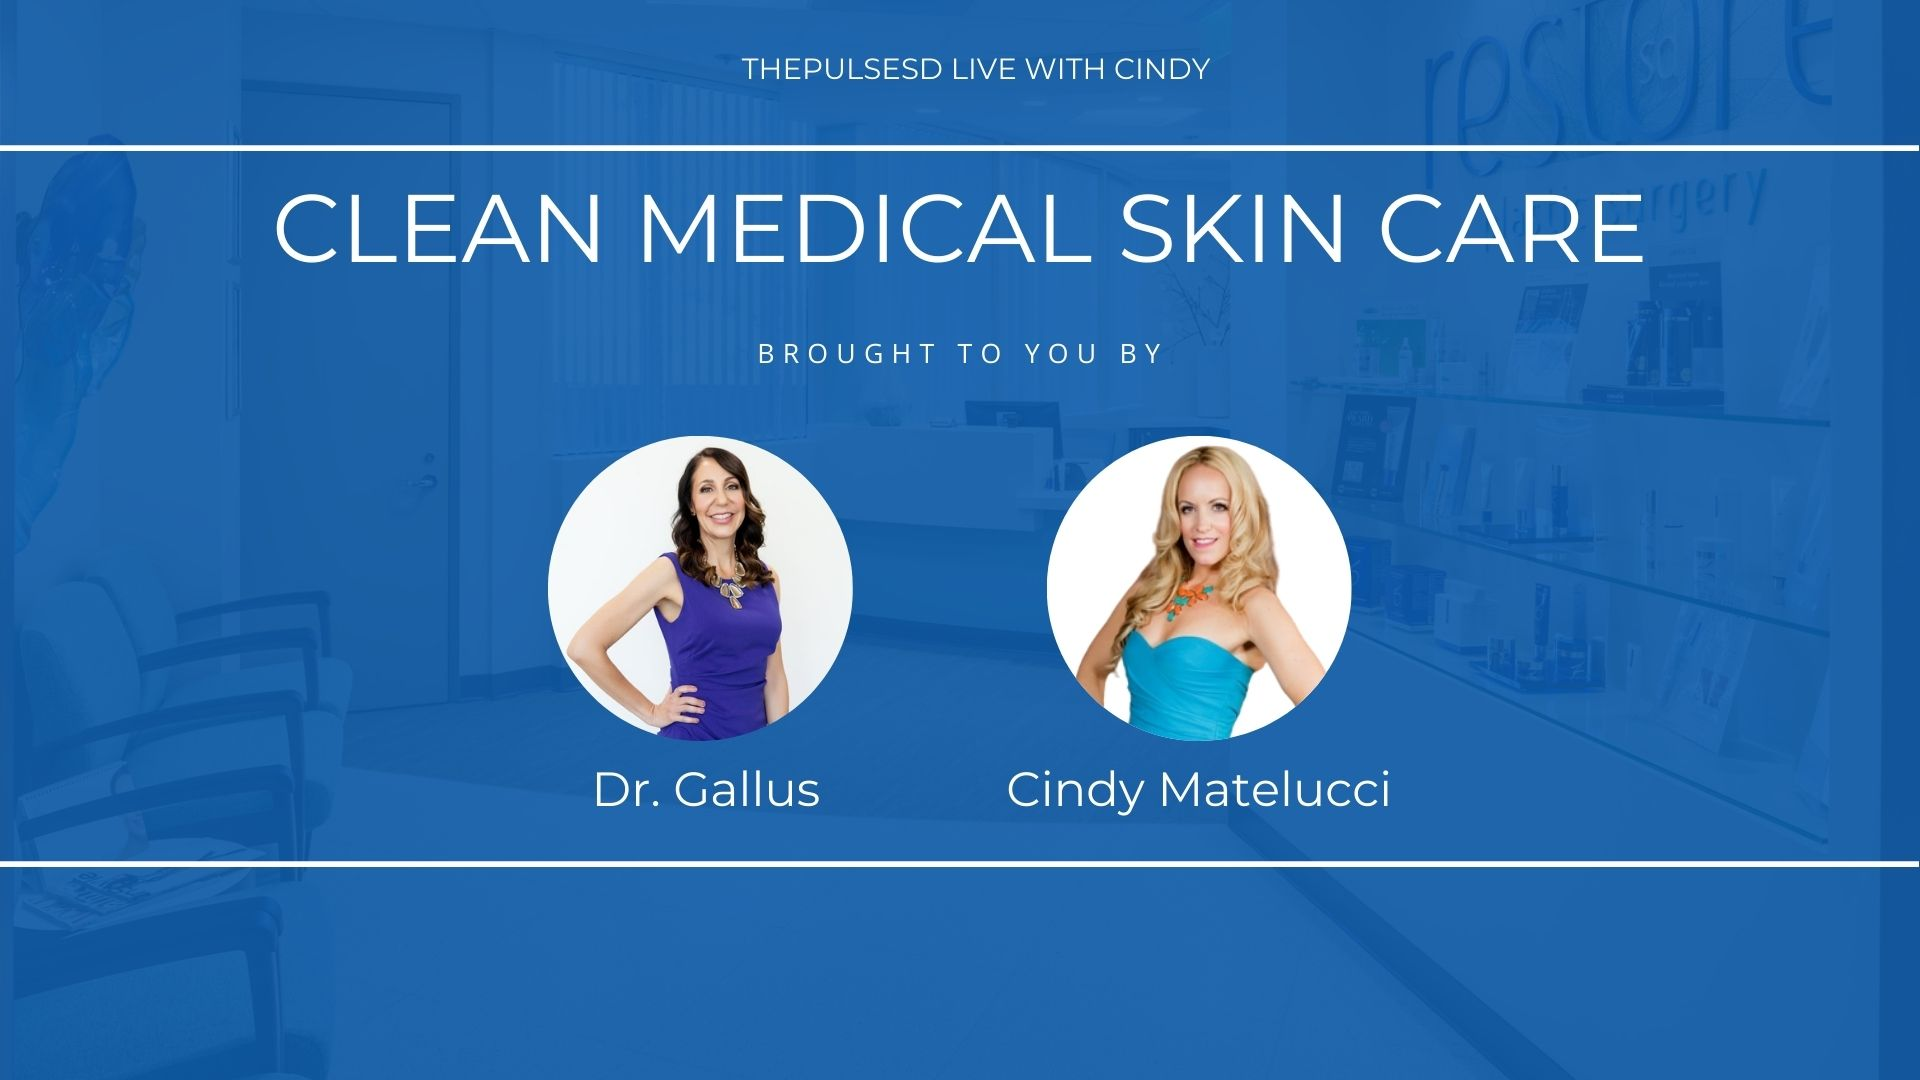 Clean Medical Skin Care